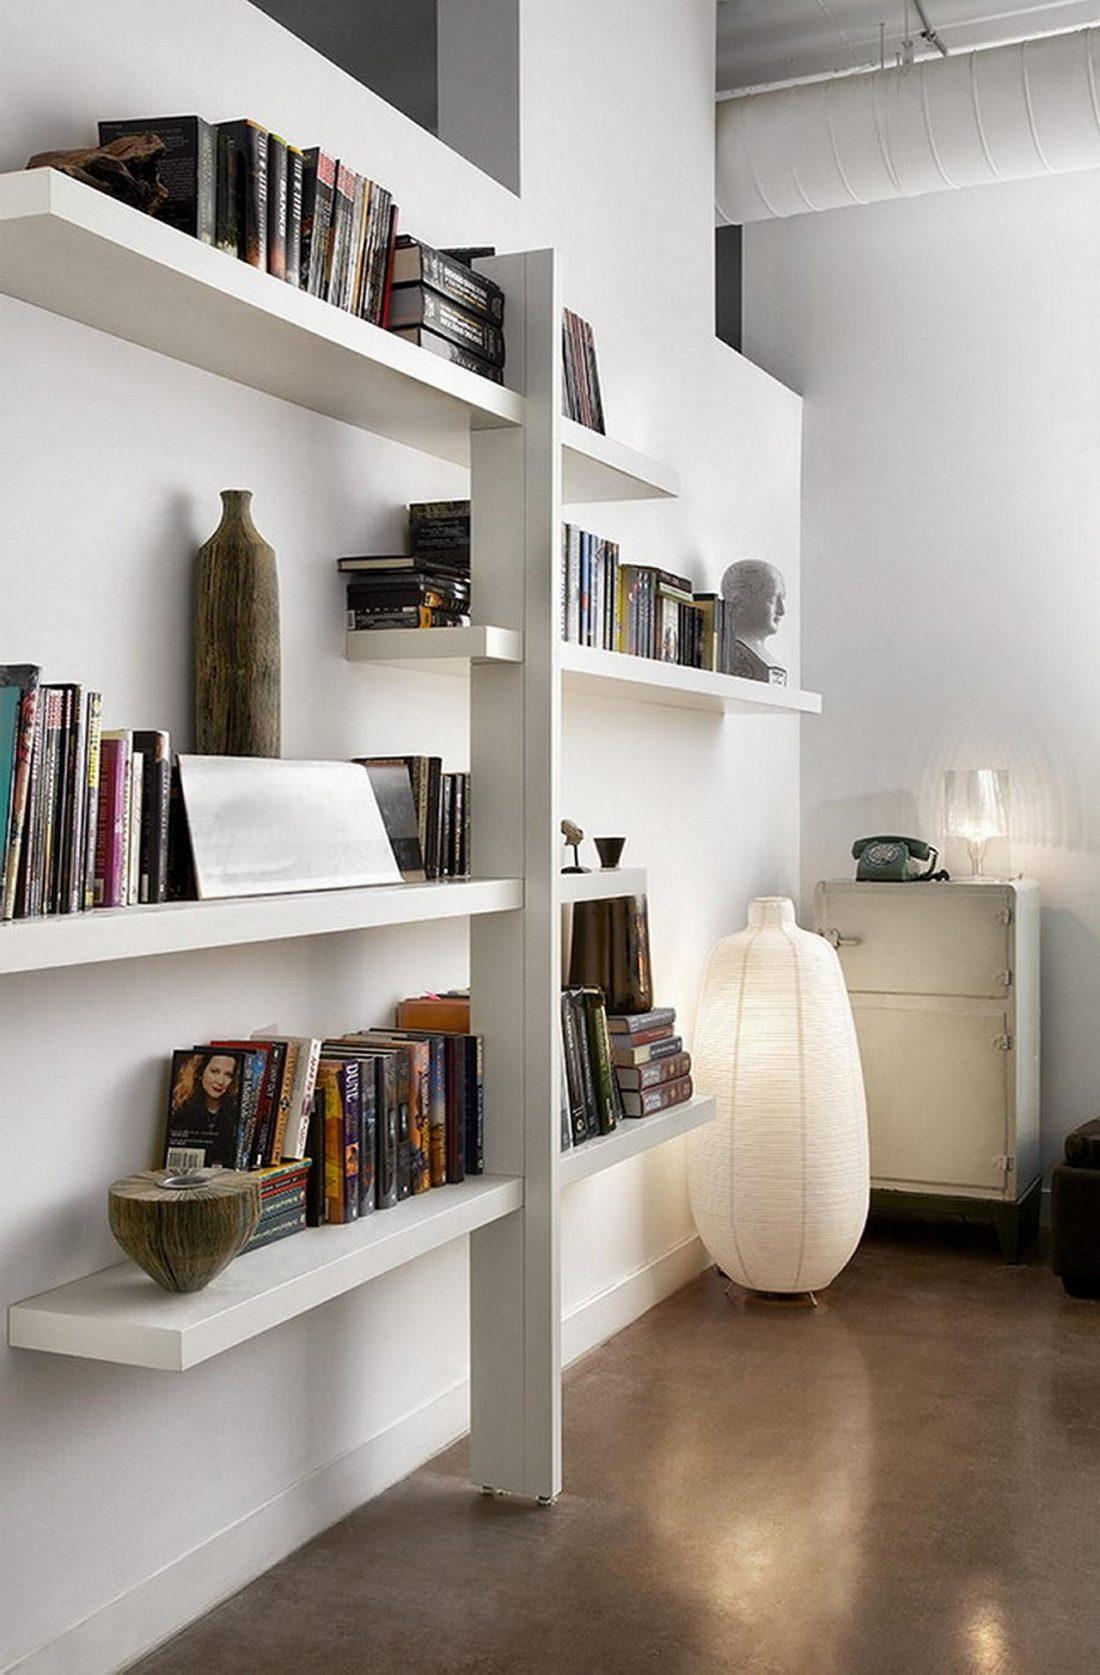 Дизайн интерьера квартиры в стиле лофт 33